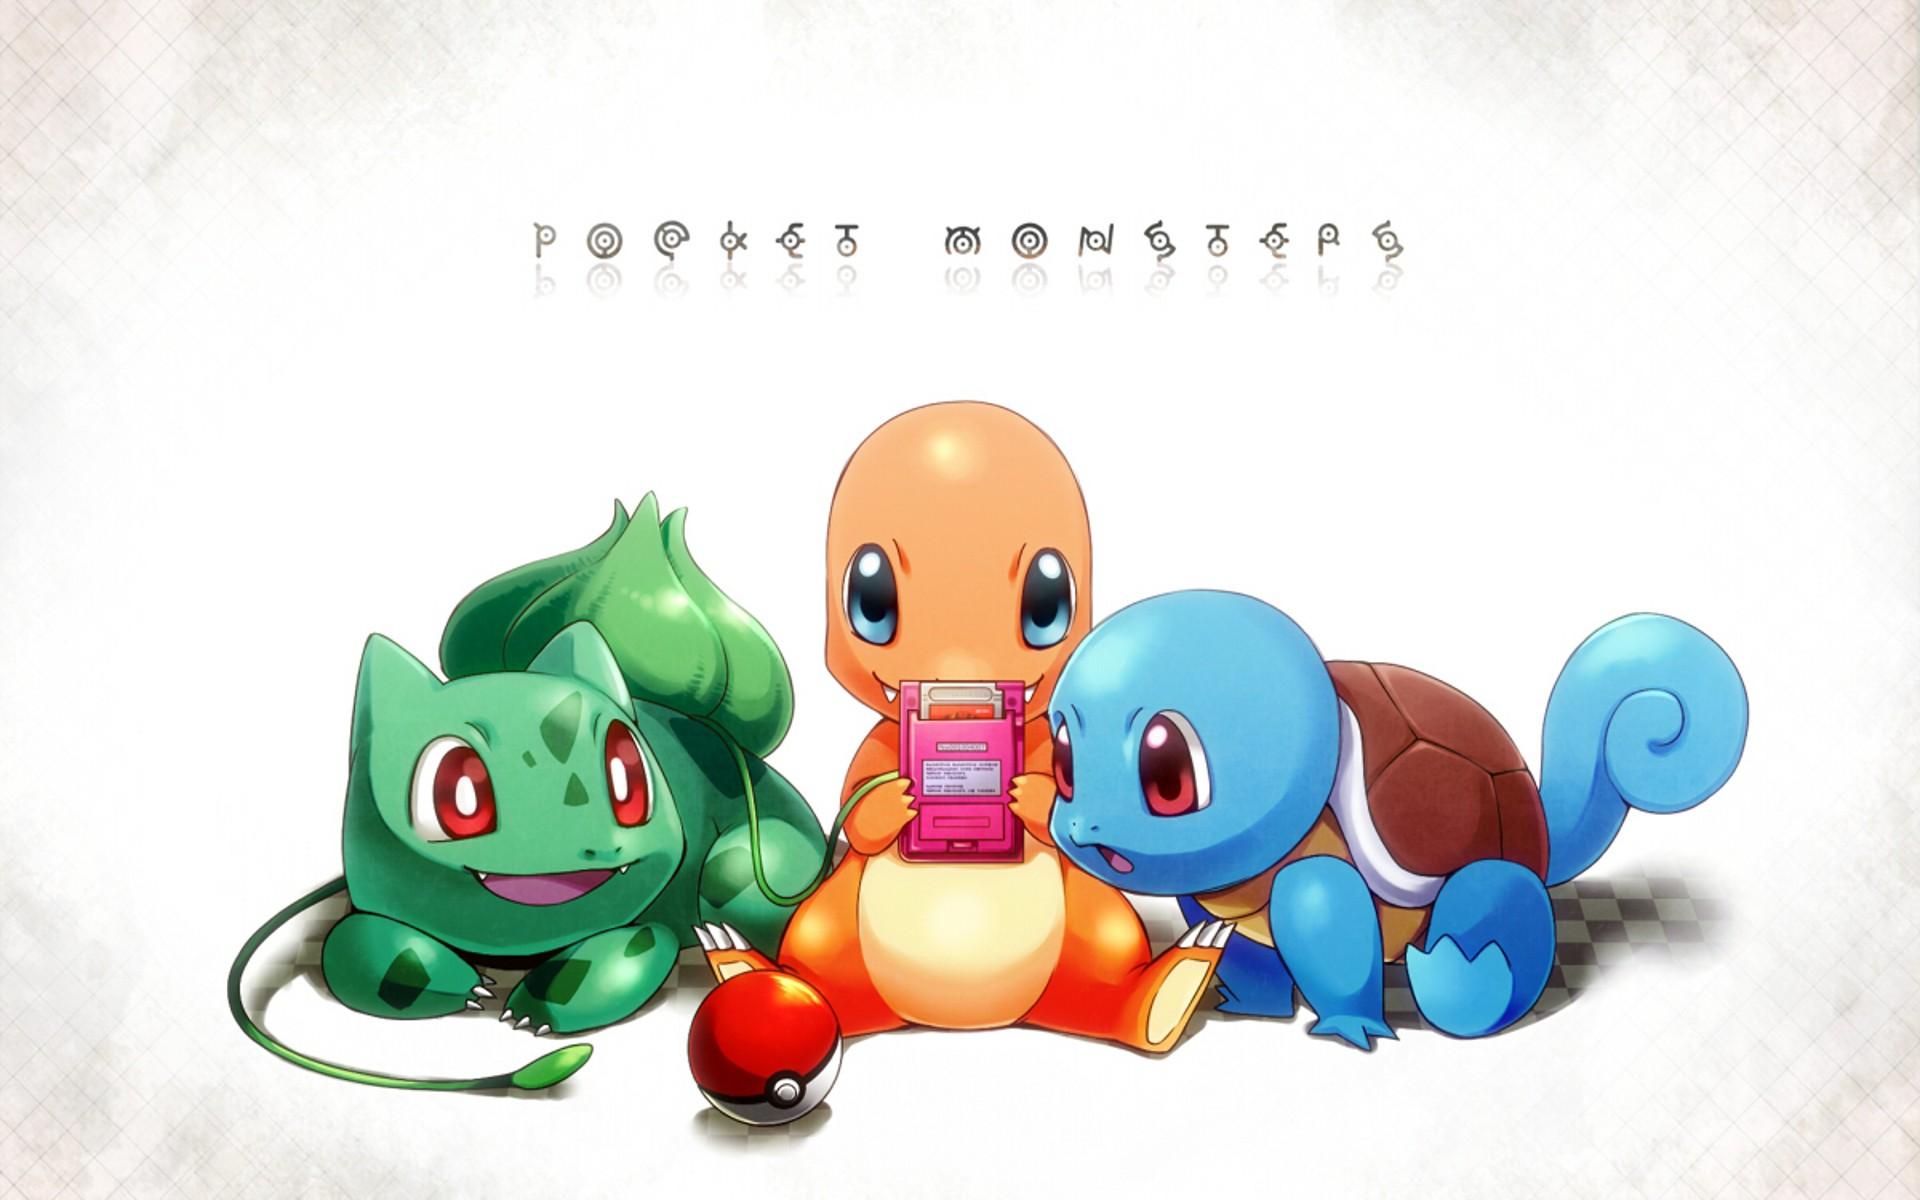 Grass Pokémon Wallpapers - Wallpaper Cave |Starter Pokemon Phone Wallpaper